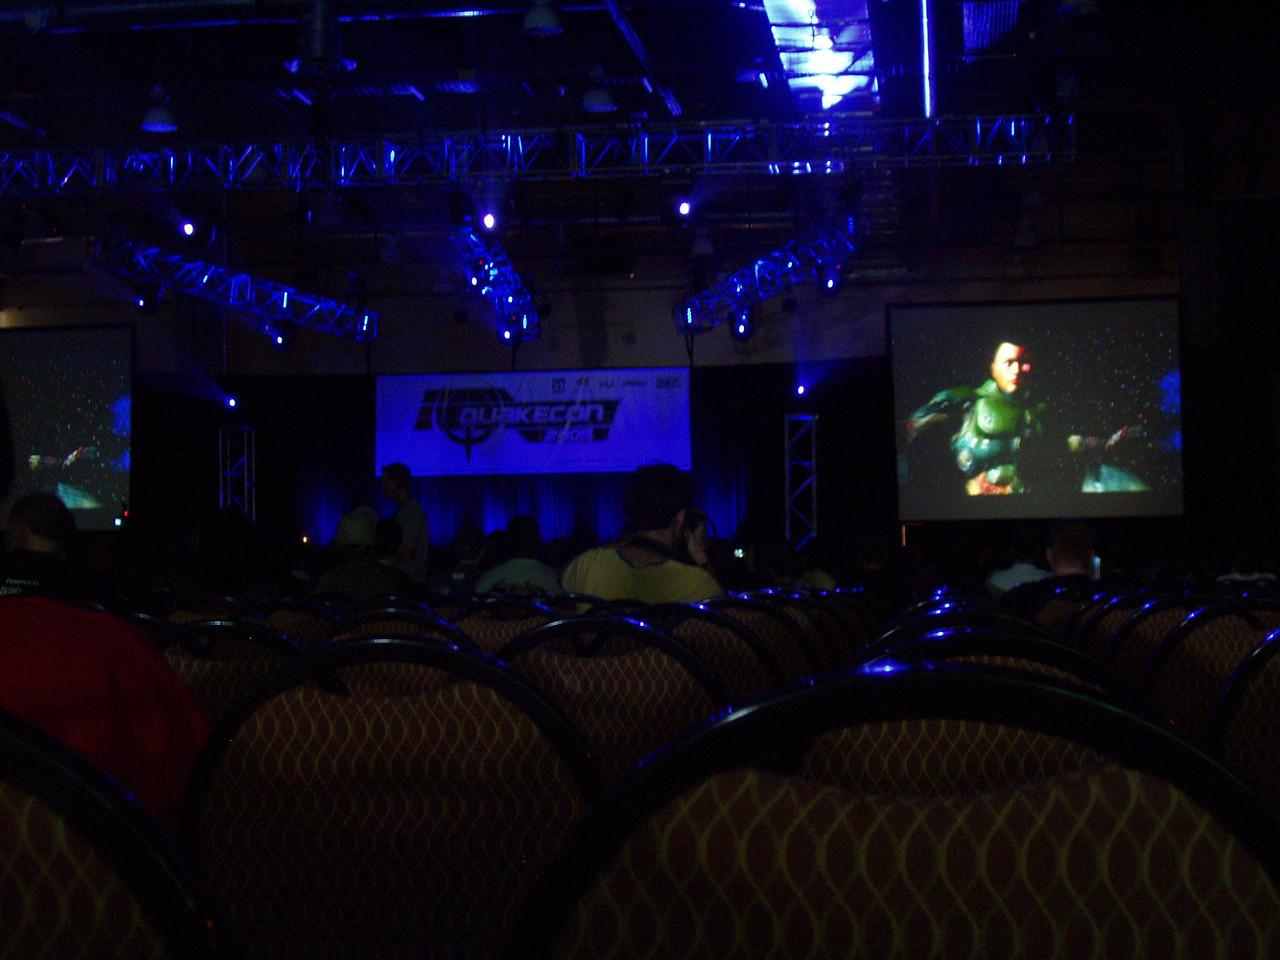 Qcon Day 2 Quake 4 single player presentation